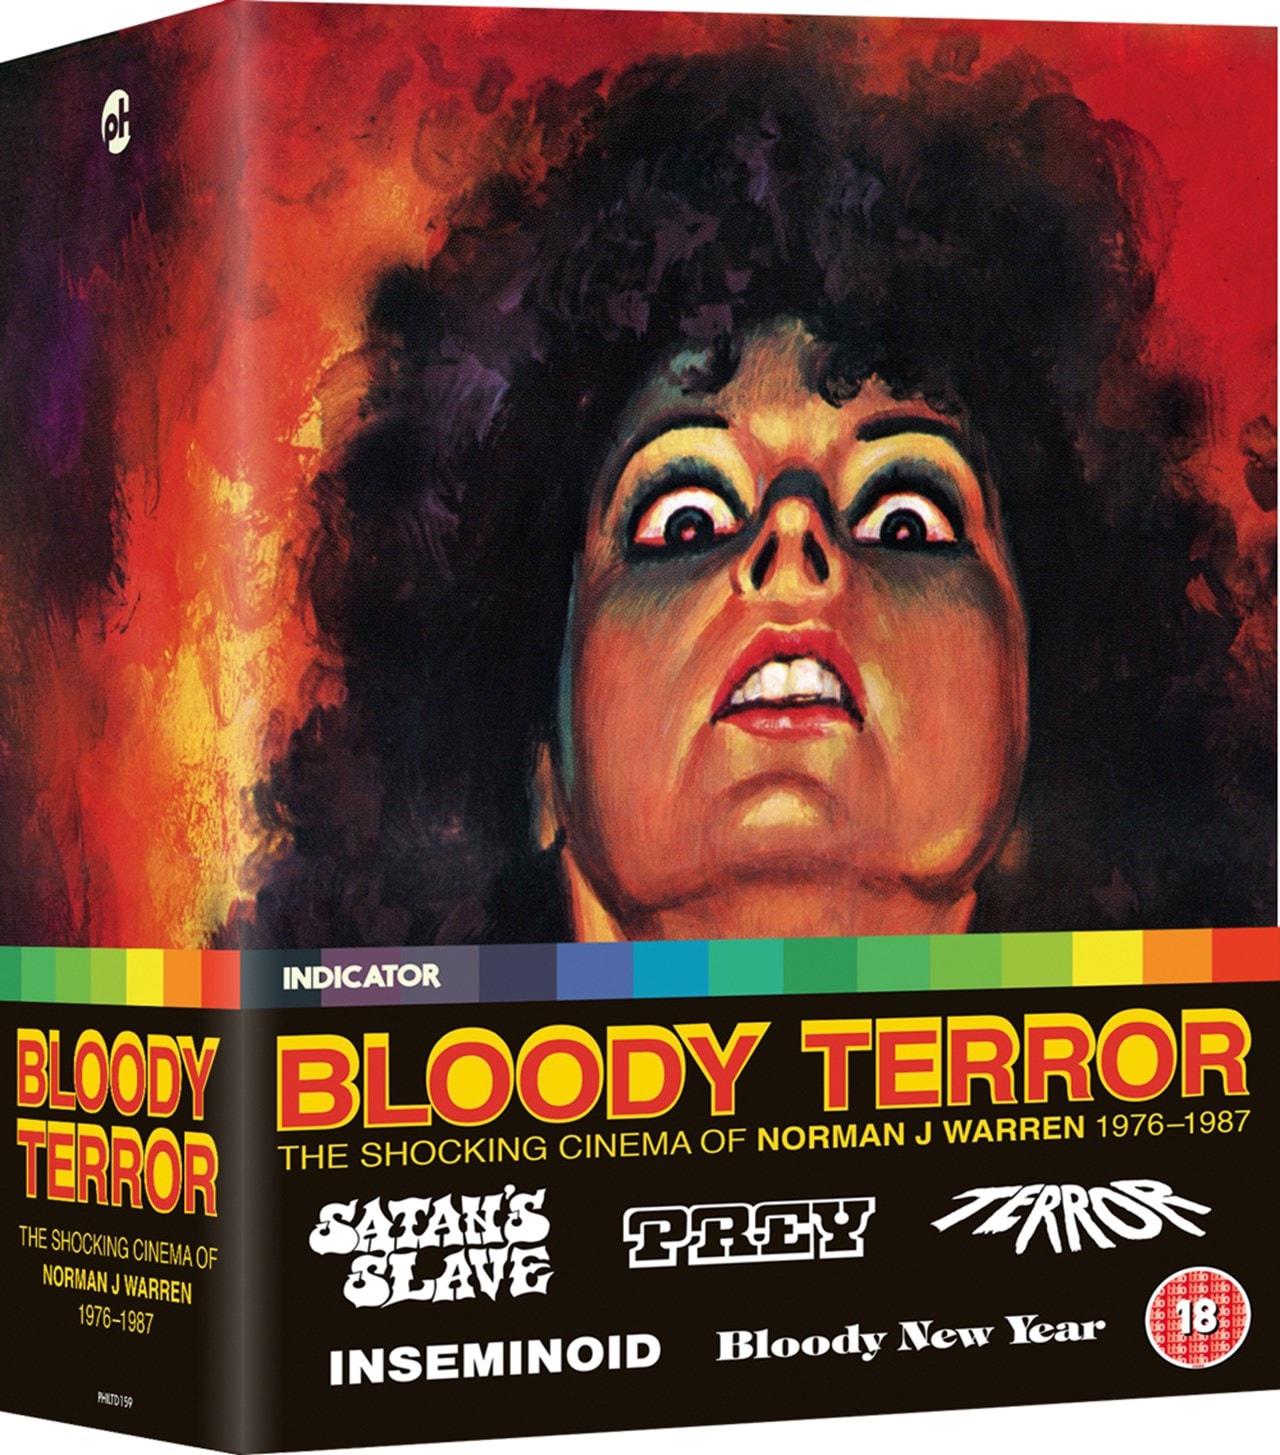 Bloody Terror - The Shocking Cinema of Norman J Warren 1976-1987 - 1